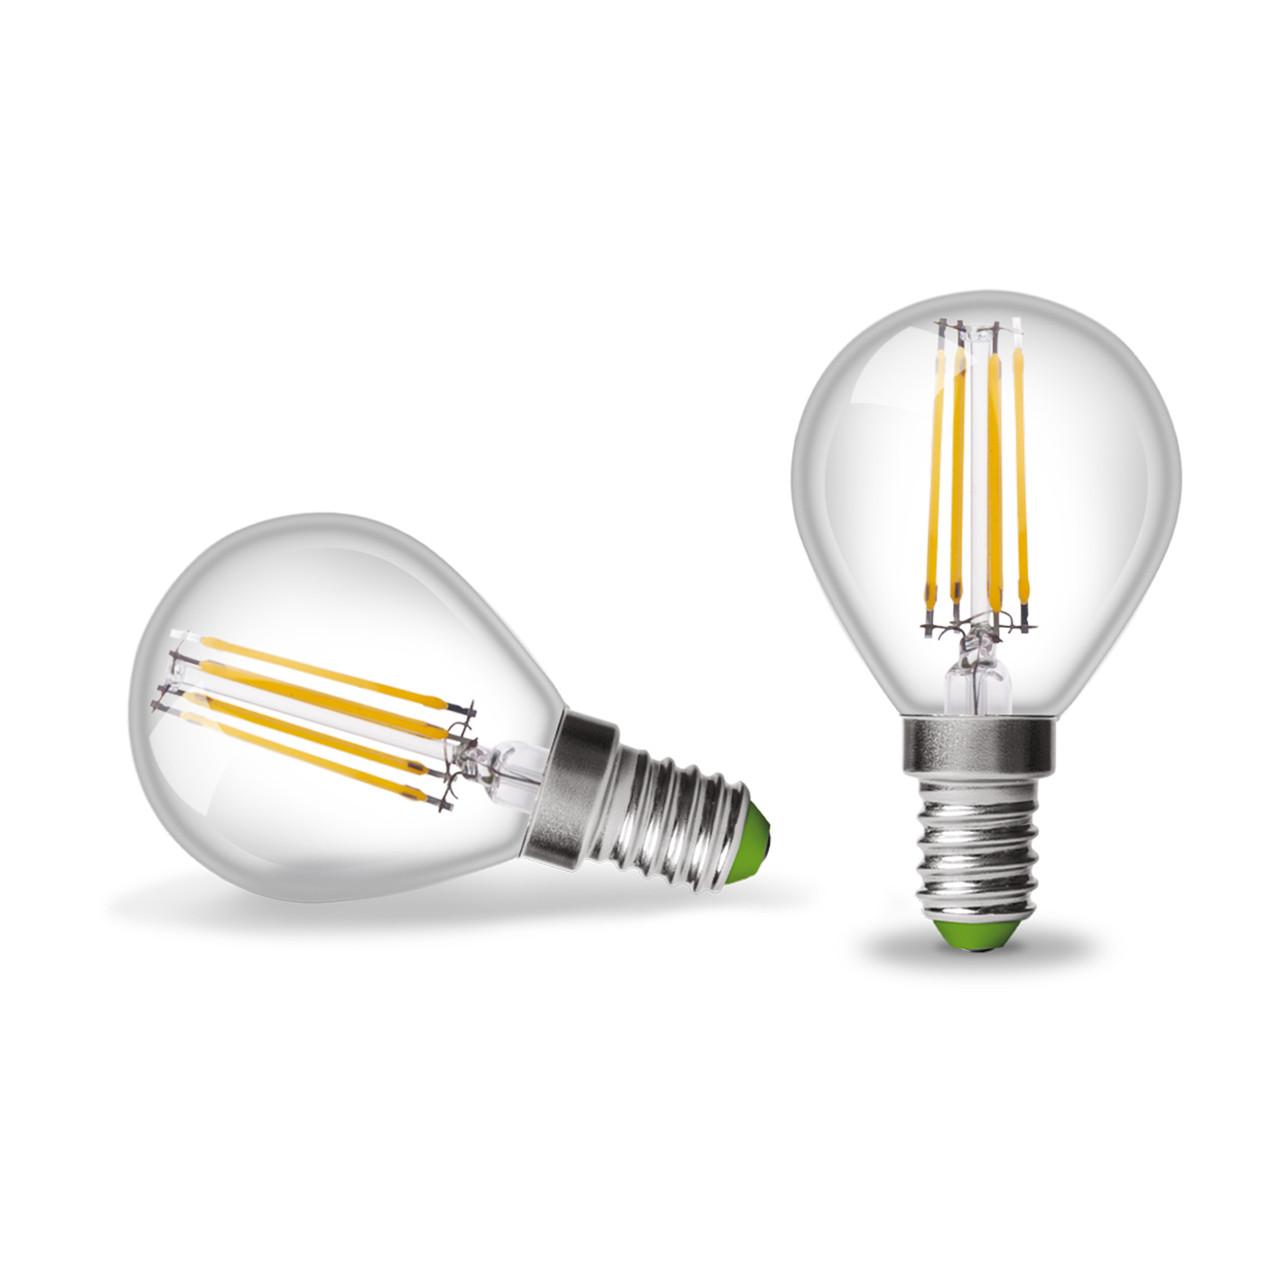 EUROLAMP LED Лампа Шар ArtDeco 4W E14 2700K (прозрачная)